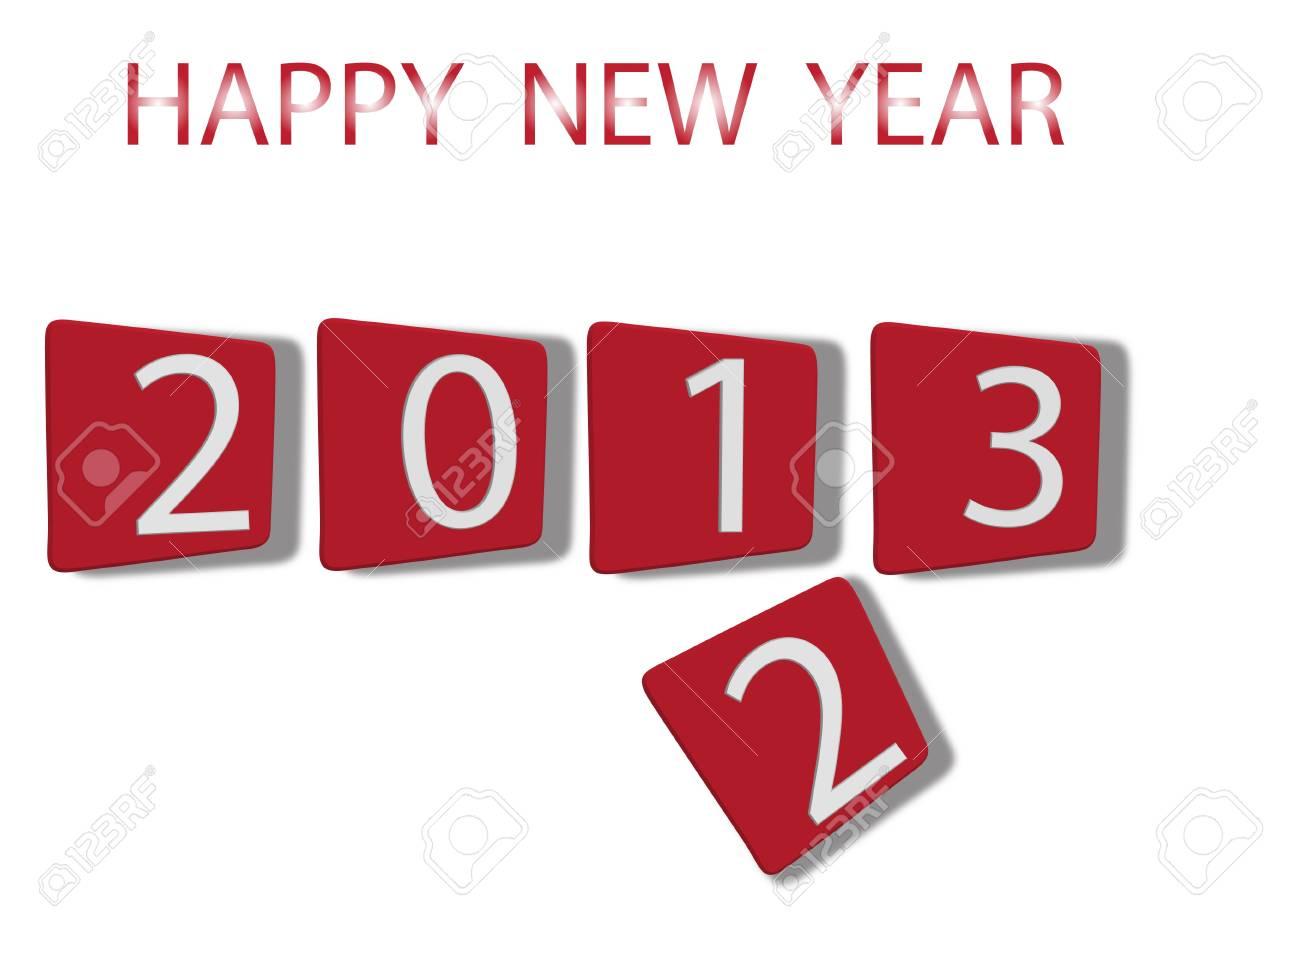 New Year 2013 Stock Vector - 18550890